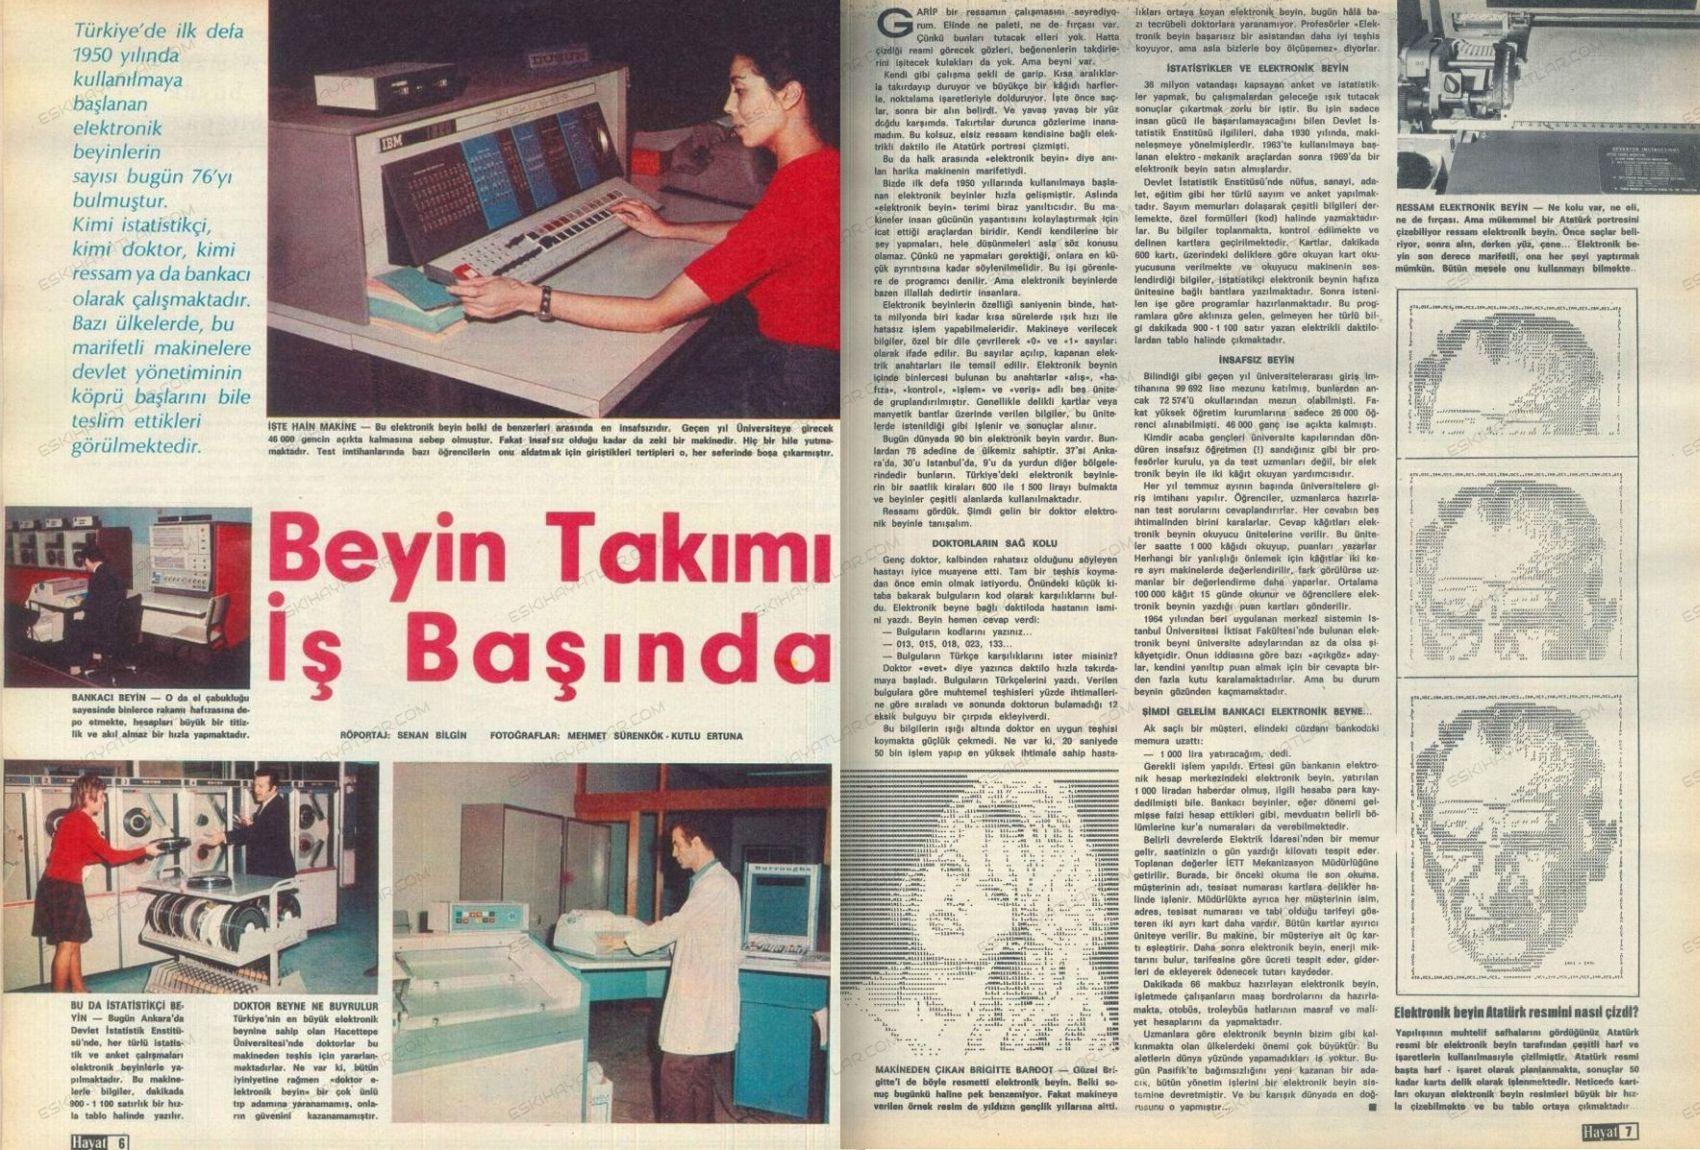 0240-yetmisli-yillarda-turkiyede-bilgisayar-kullanimi-1972-hayat-dergisi-elektronik-beyin-ibm-700-serisi-ibm-7000-gorselleri (4)